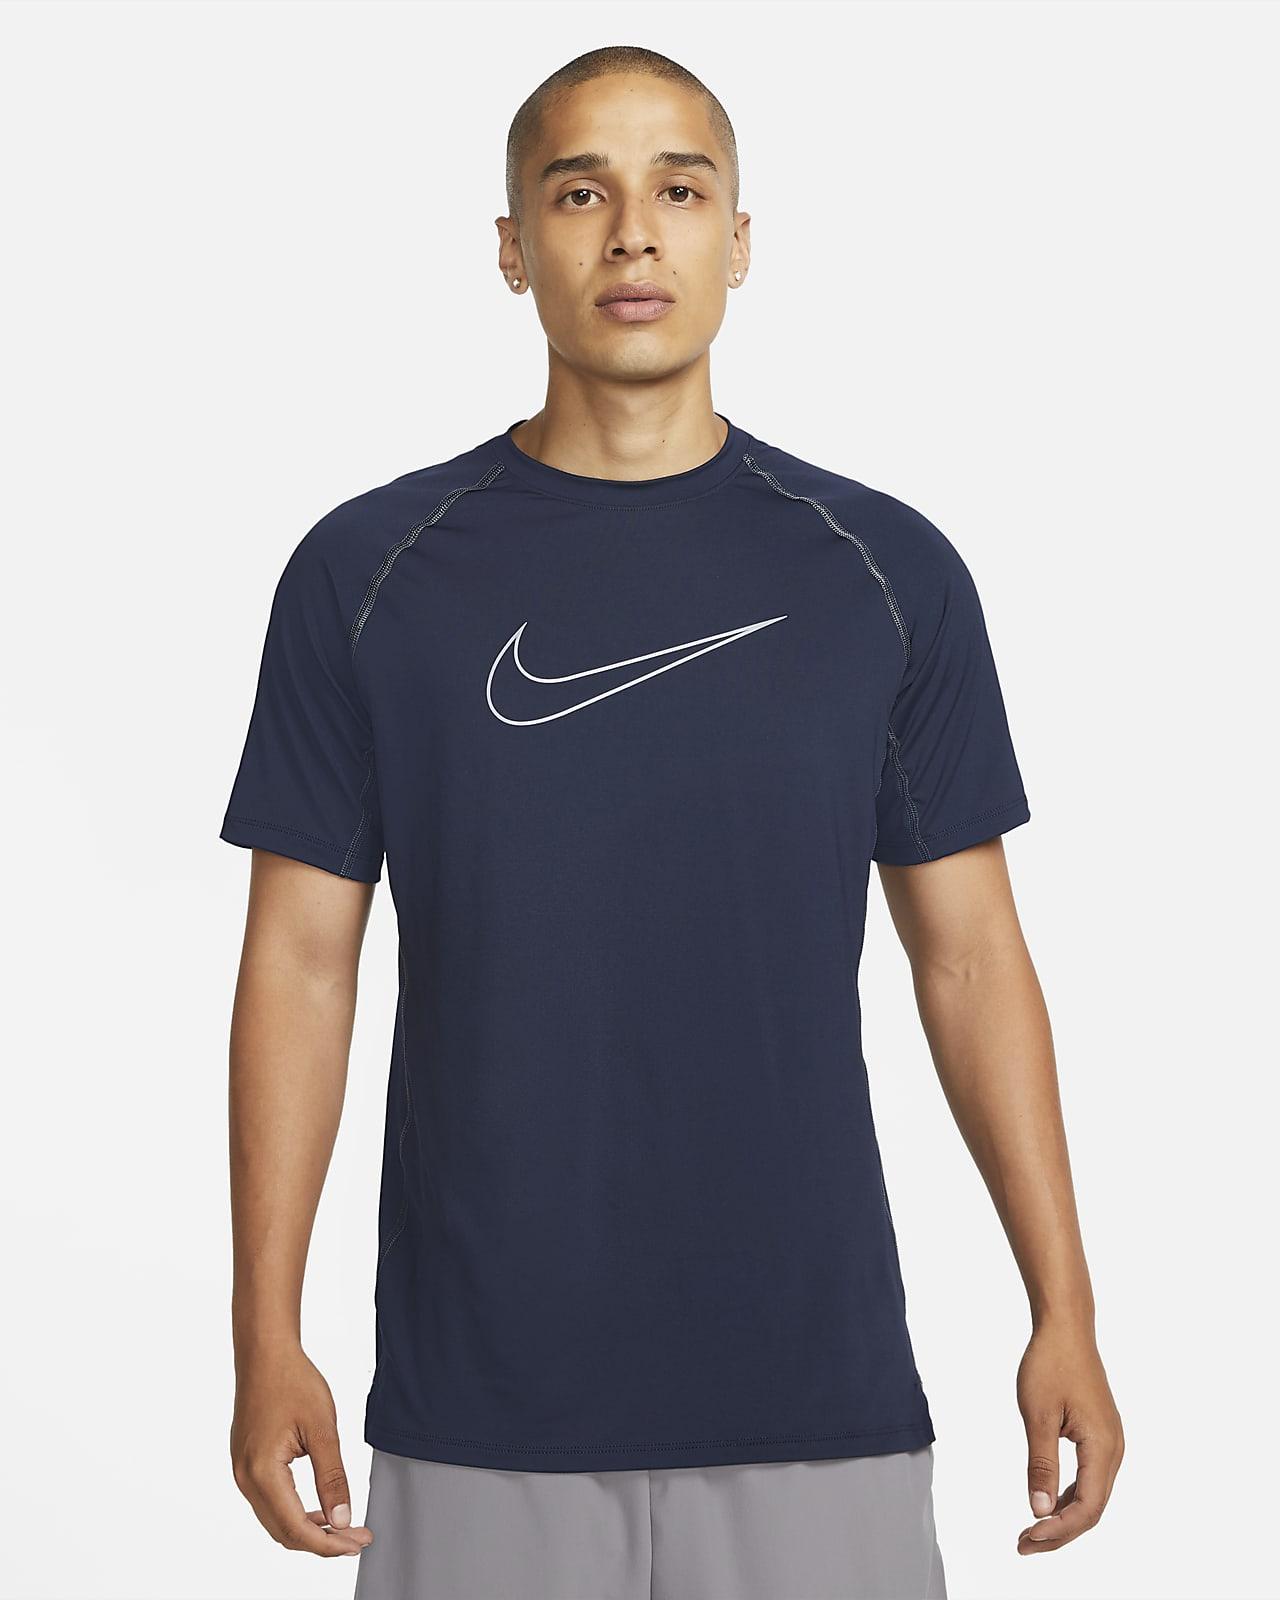 Playera de manga corta con ajuste slim para hombre Nike Pro Dri-FIT